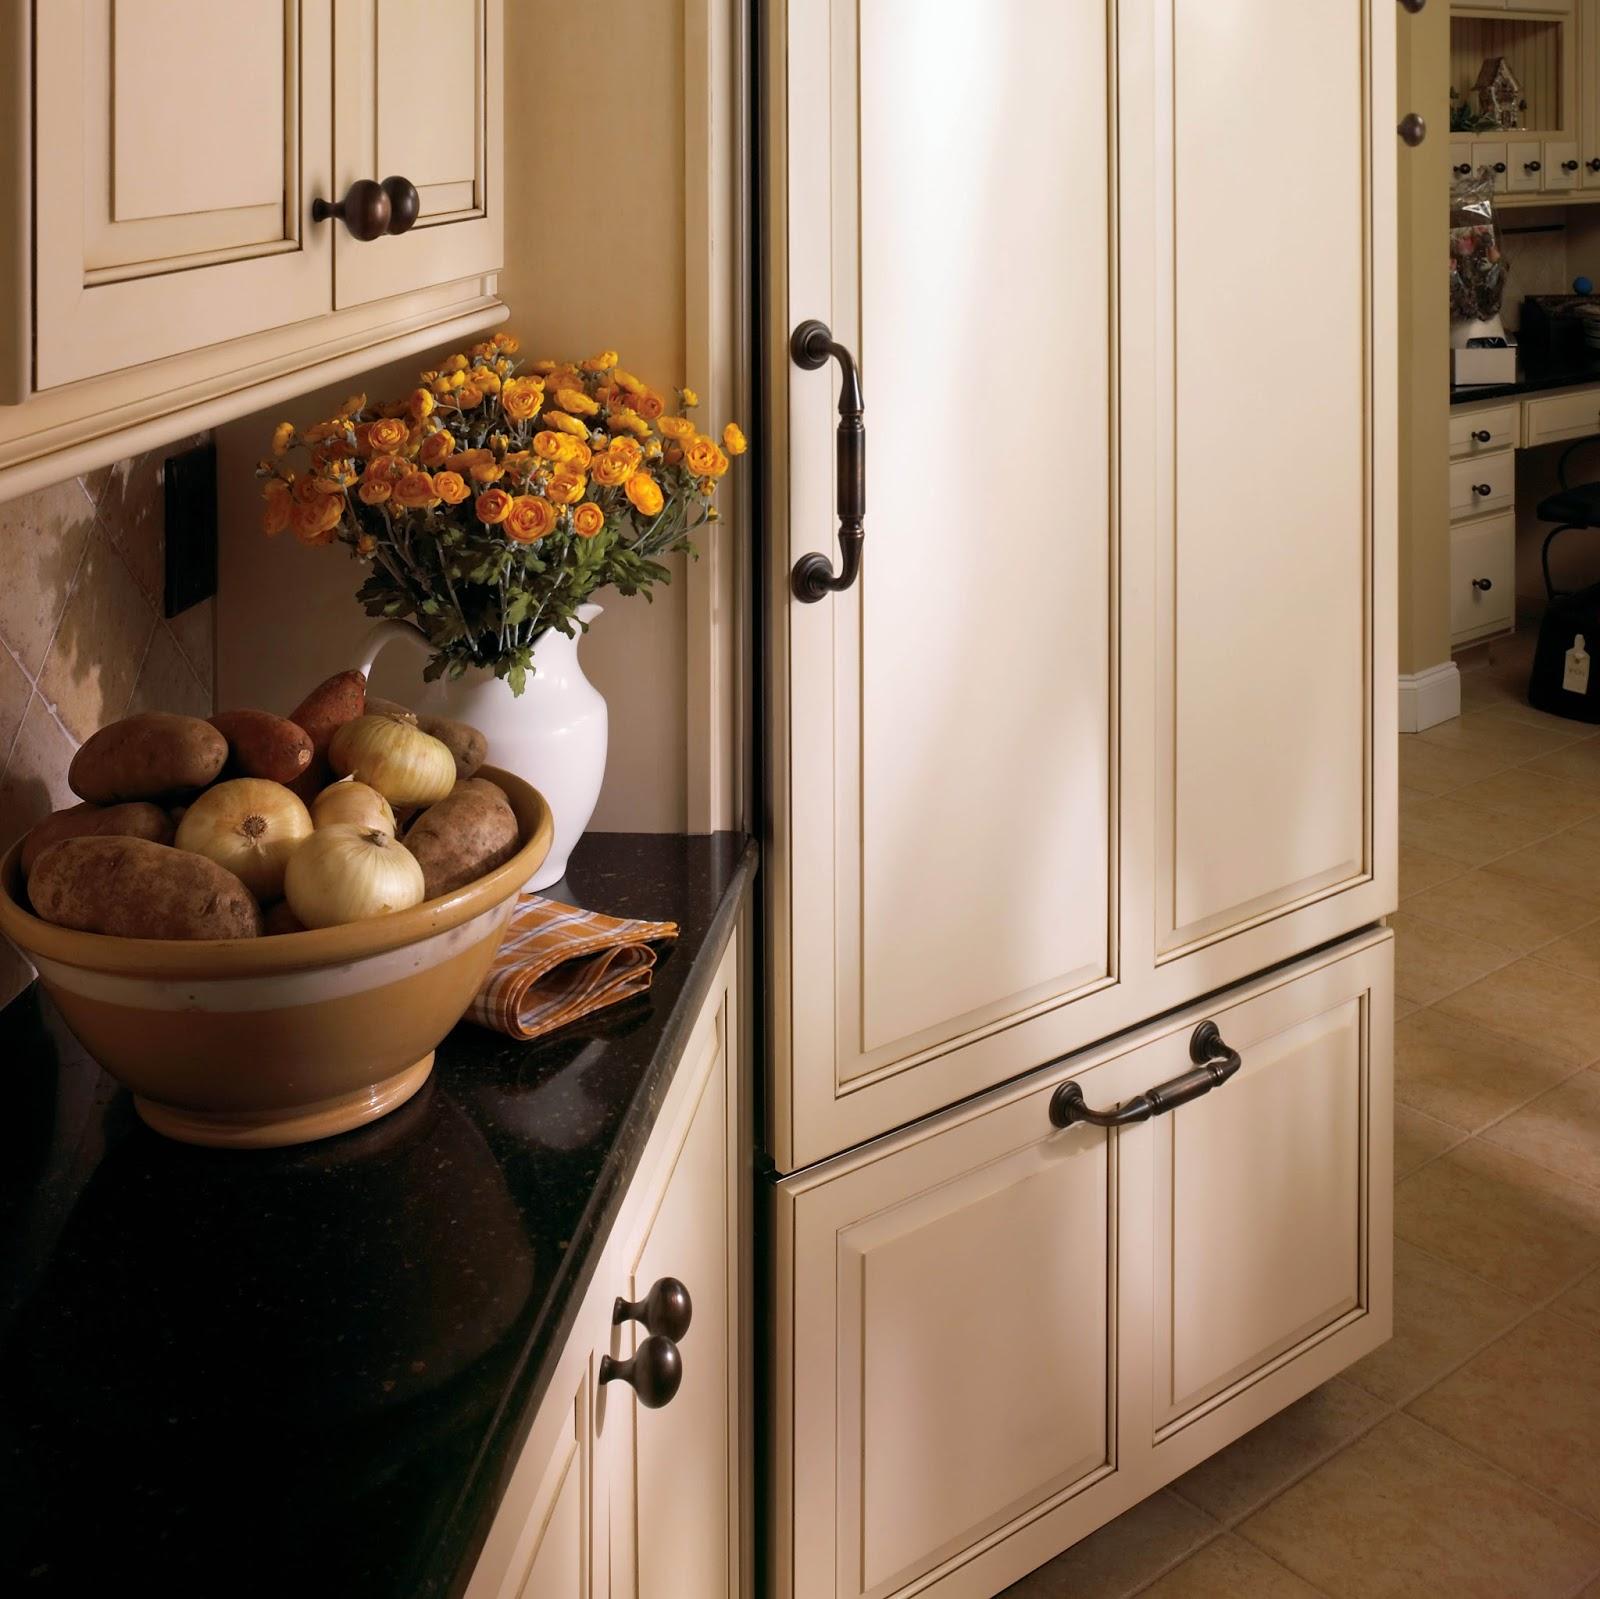 Antique Kitchen Cabinet Hardware 17 Best Ideas About Brass Hardware On Pinterest Solid Wood